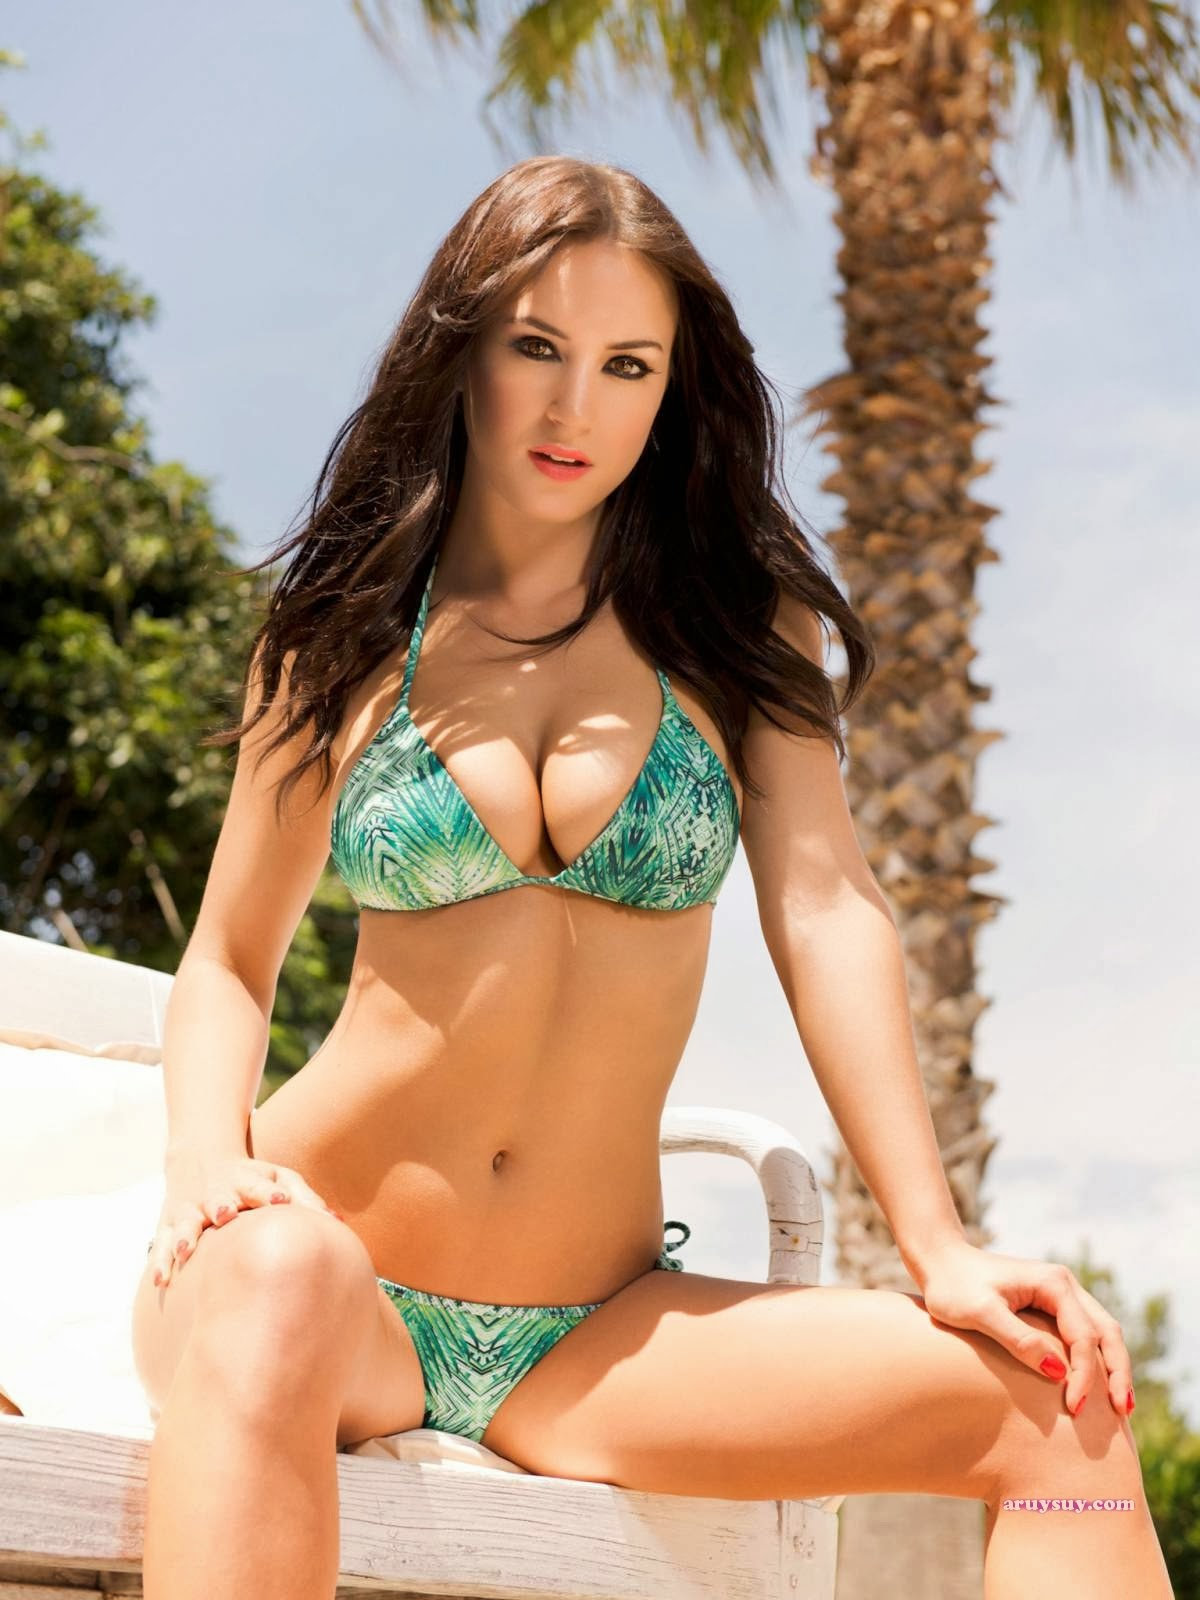 Cleavage Leah Renee Cudmore nude (51 images) Fappening, YouTube, in bikini